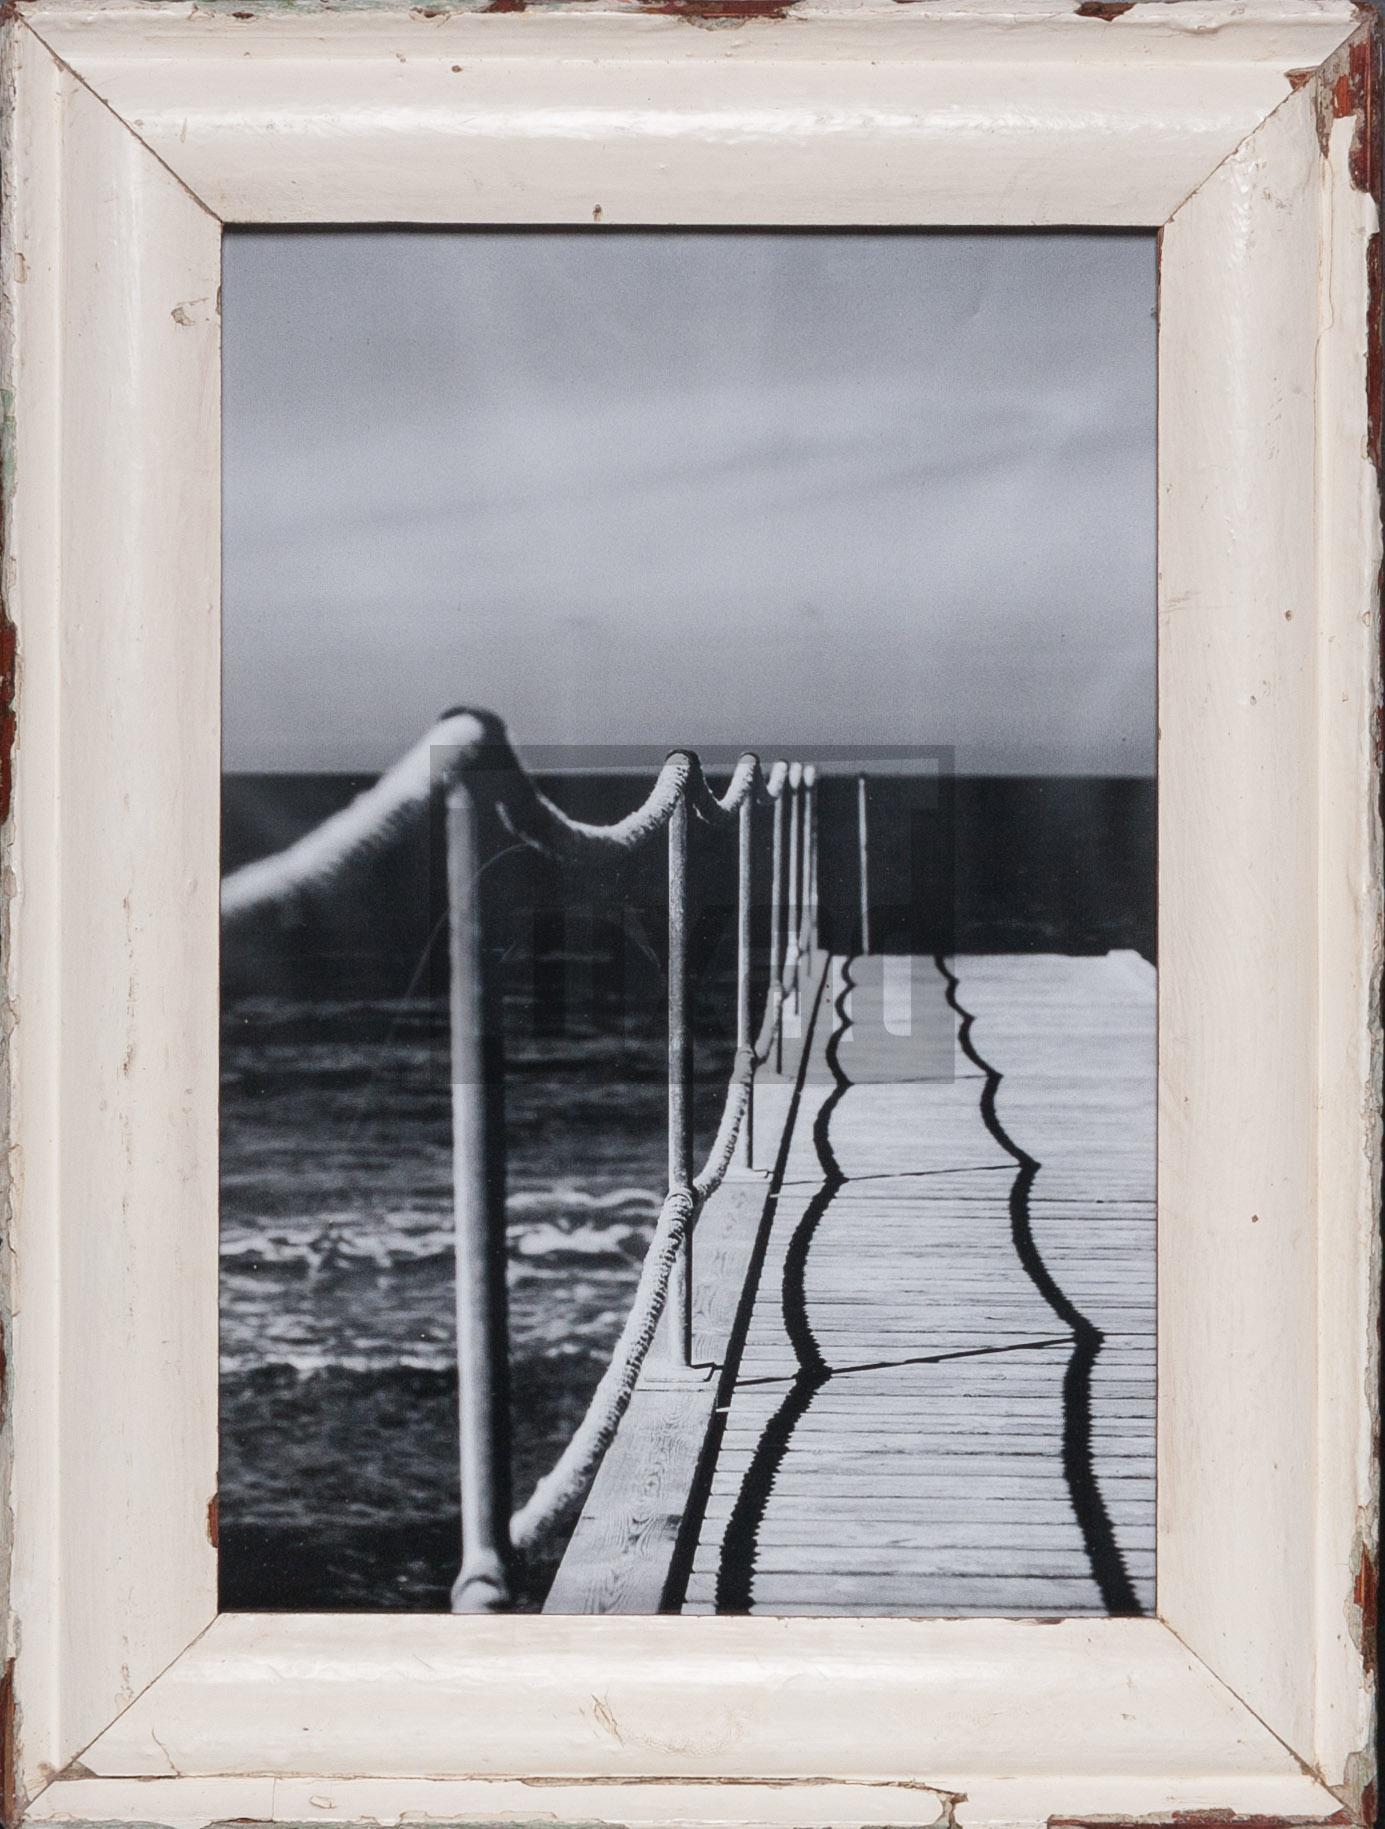 Holzbilderrahmen für Fotos ca. 29,7 x 42 cm